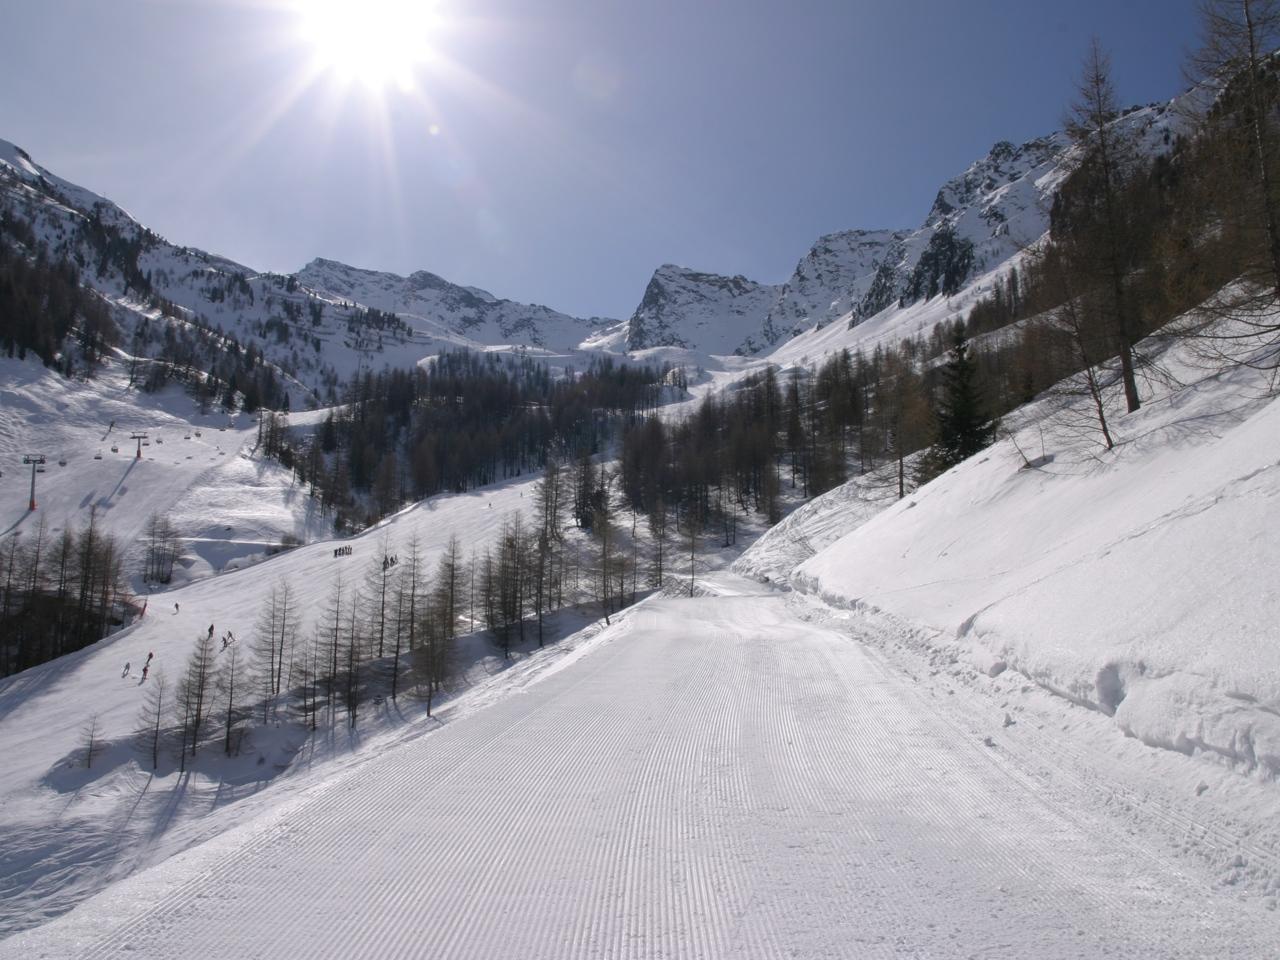 Skiarena klausberg valle aurina webcam